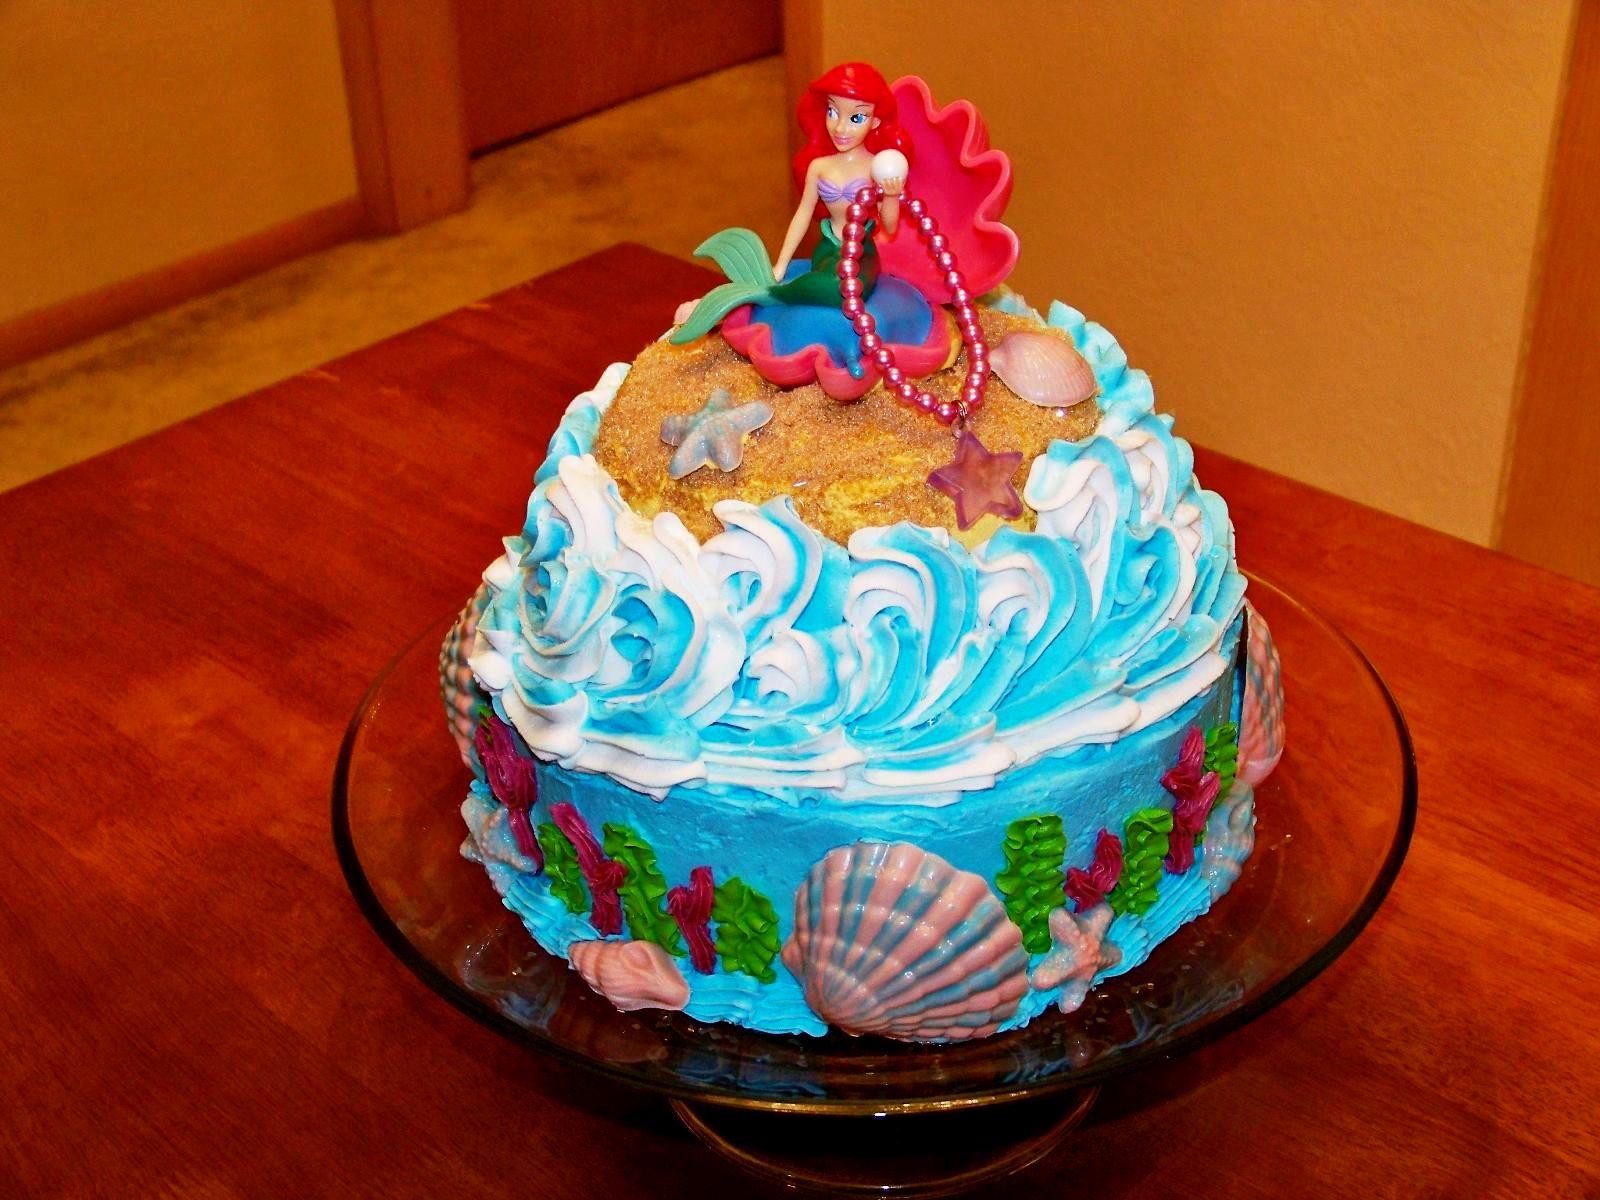 Little Mermaid Birthday Cake Walmart 7 Iballisticsquid Under The Sea Cakes Photo Under Sea Birthday